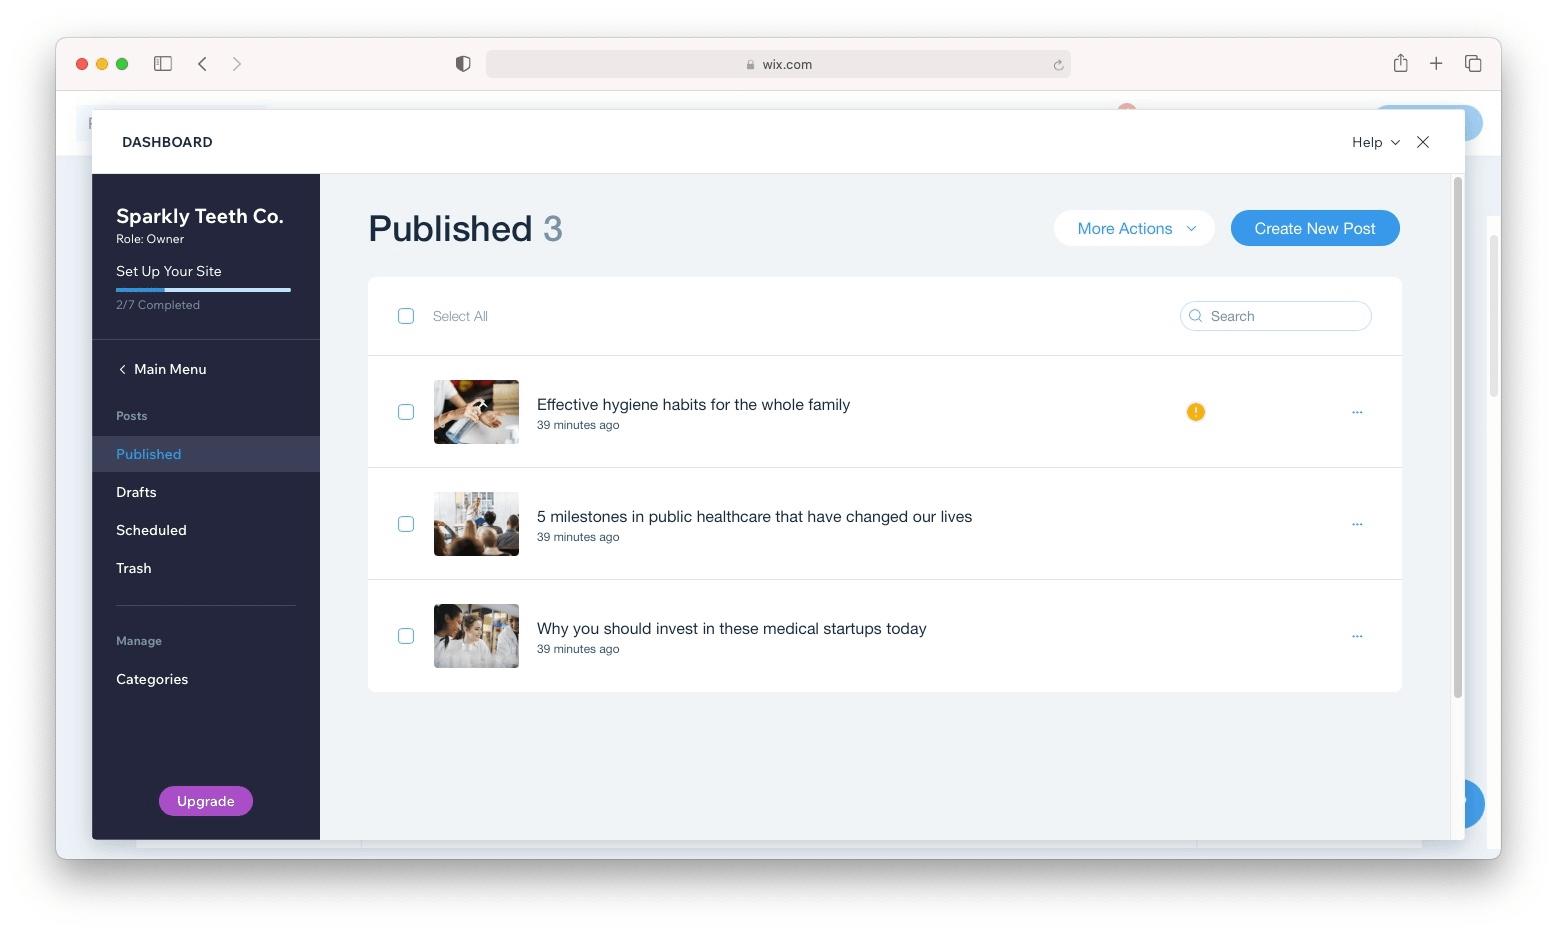 The Wix blog management dashboard